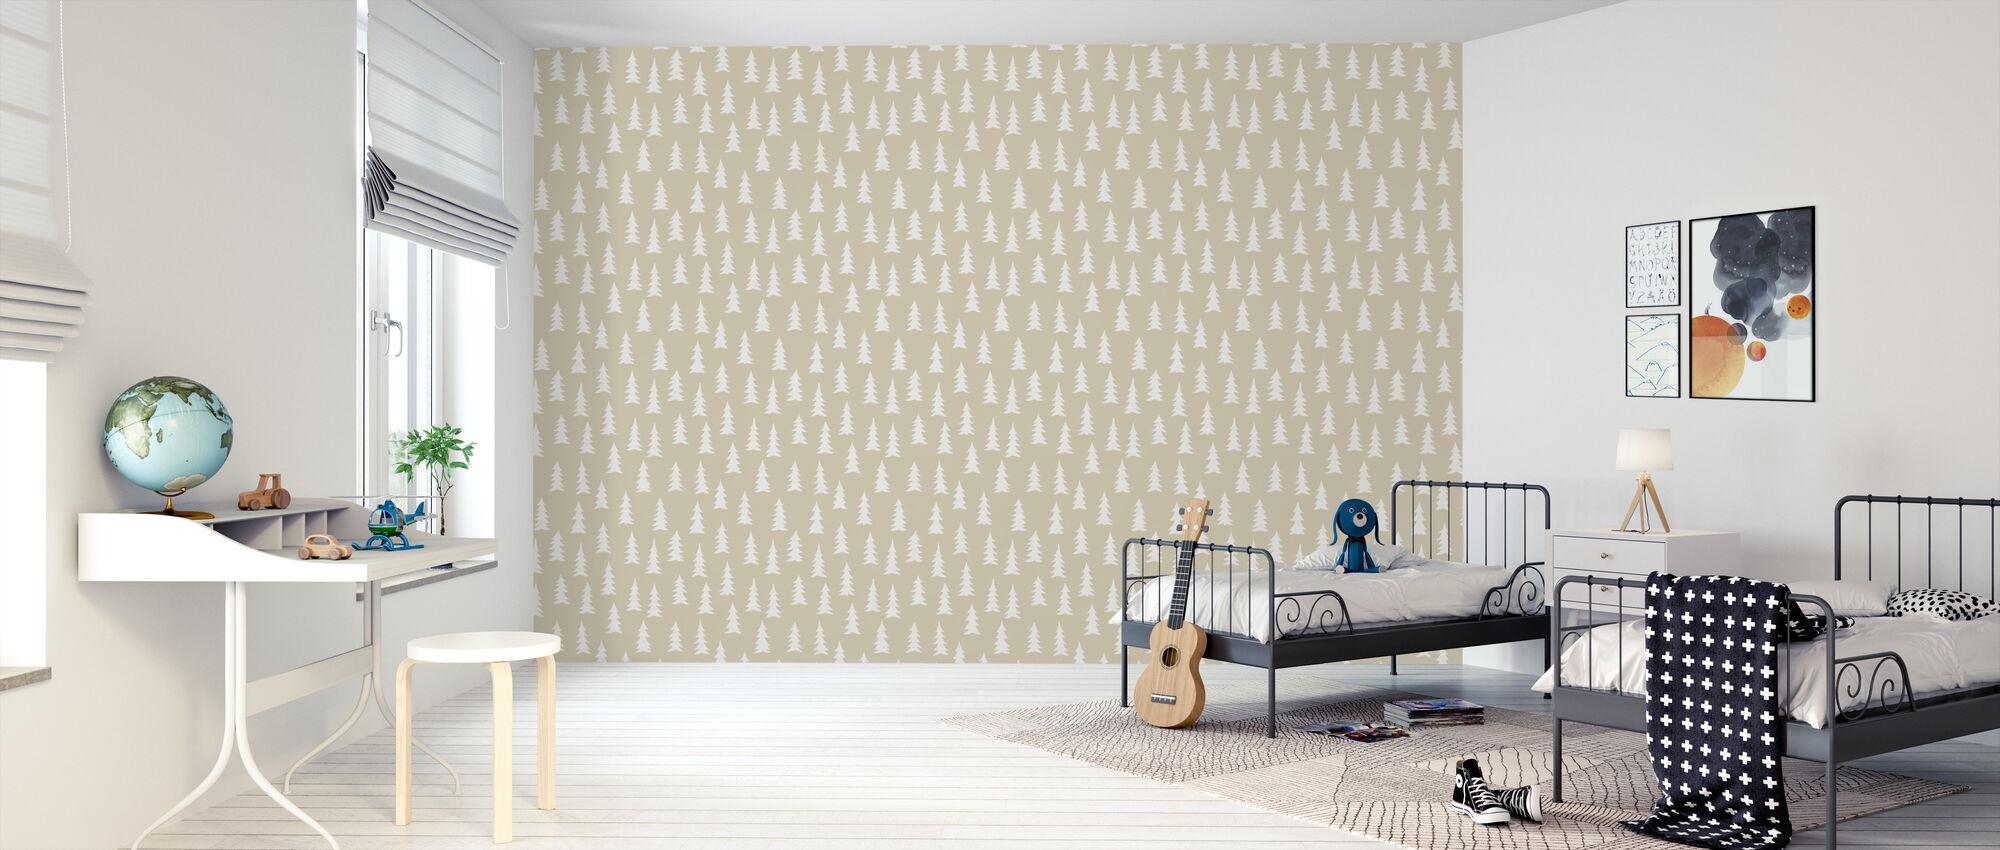 Great - Sand - Wallpaper - Kids Room